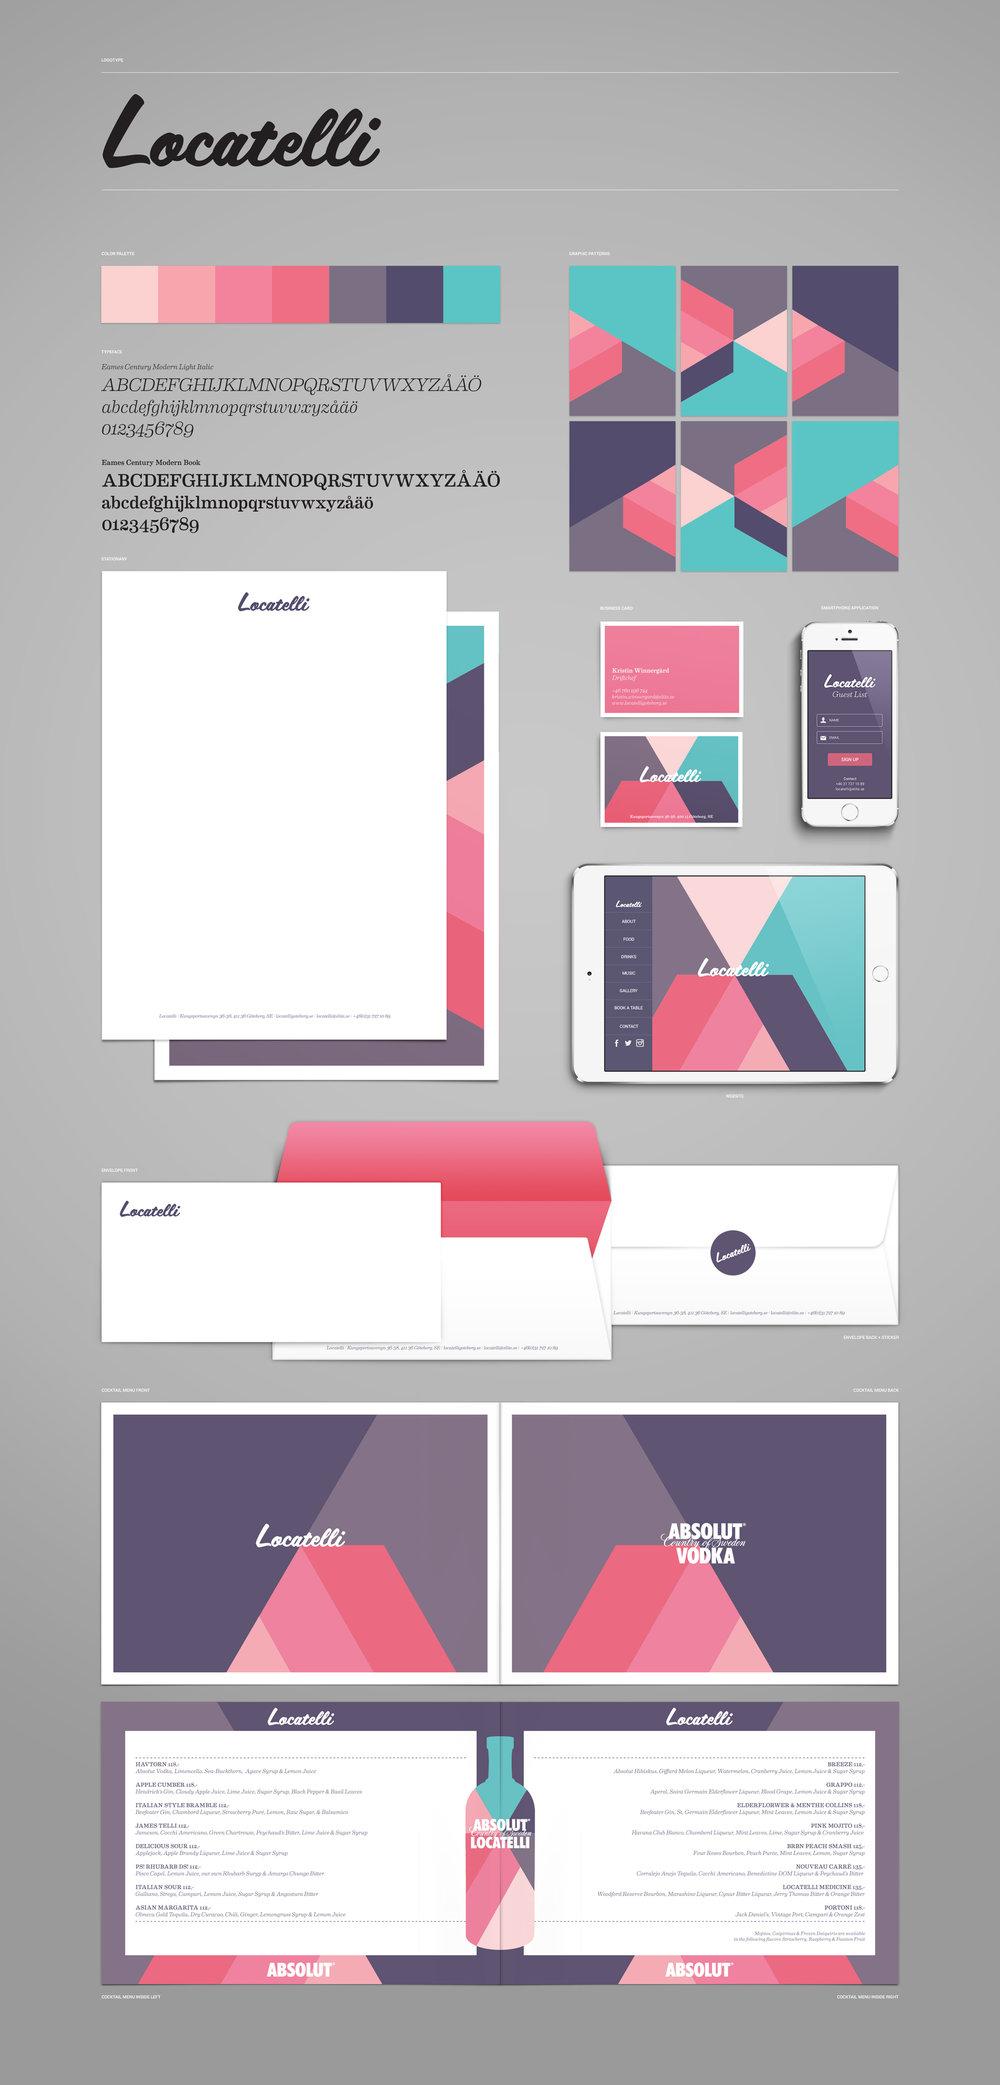 Locatelli_Branding_Identity.jpg